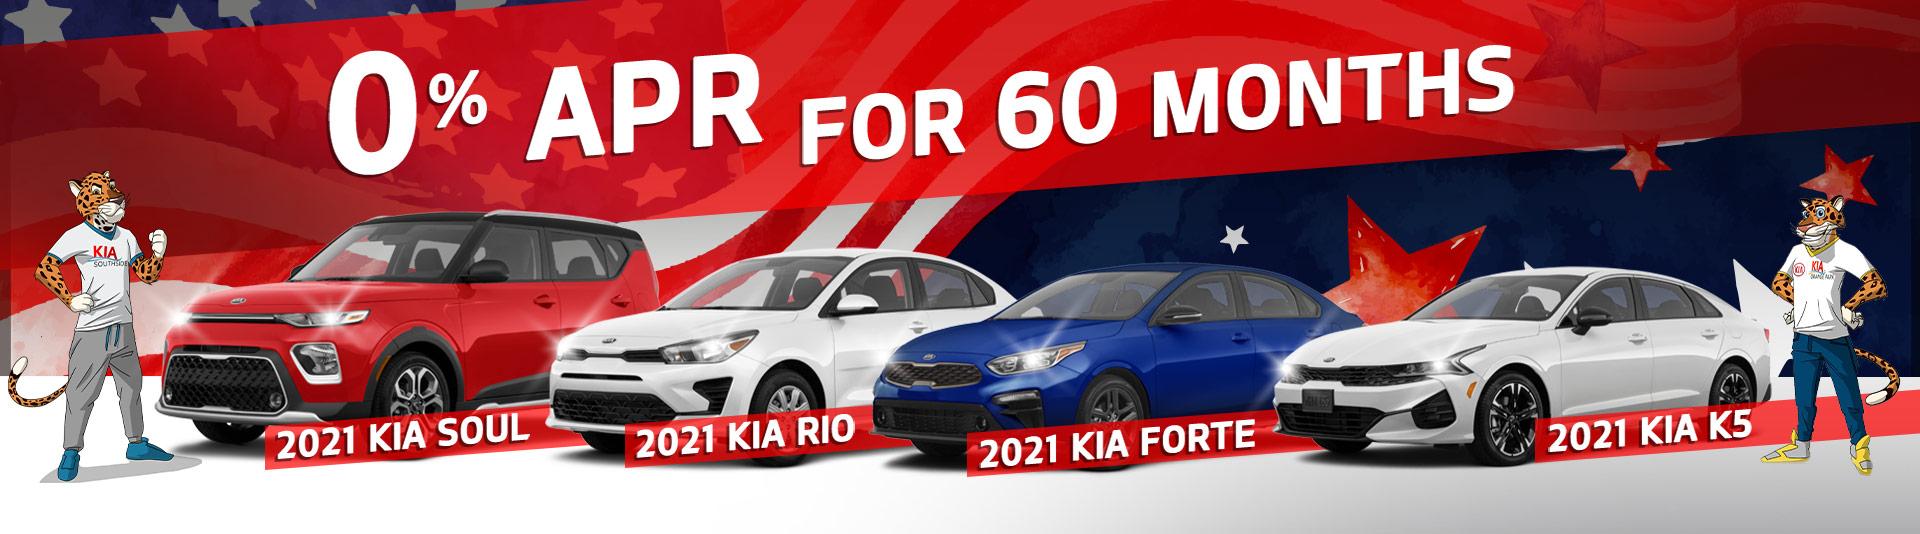 Kia zero percent offer